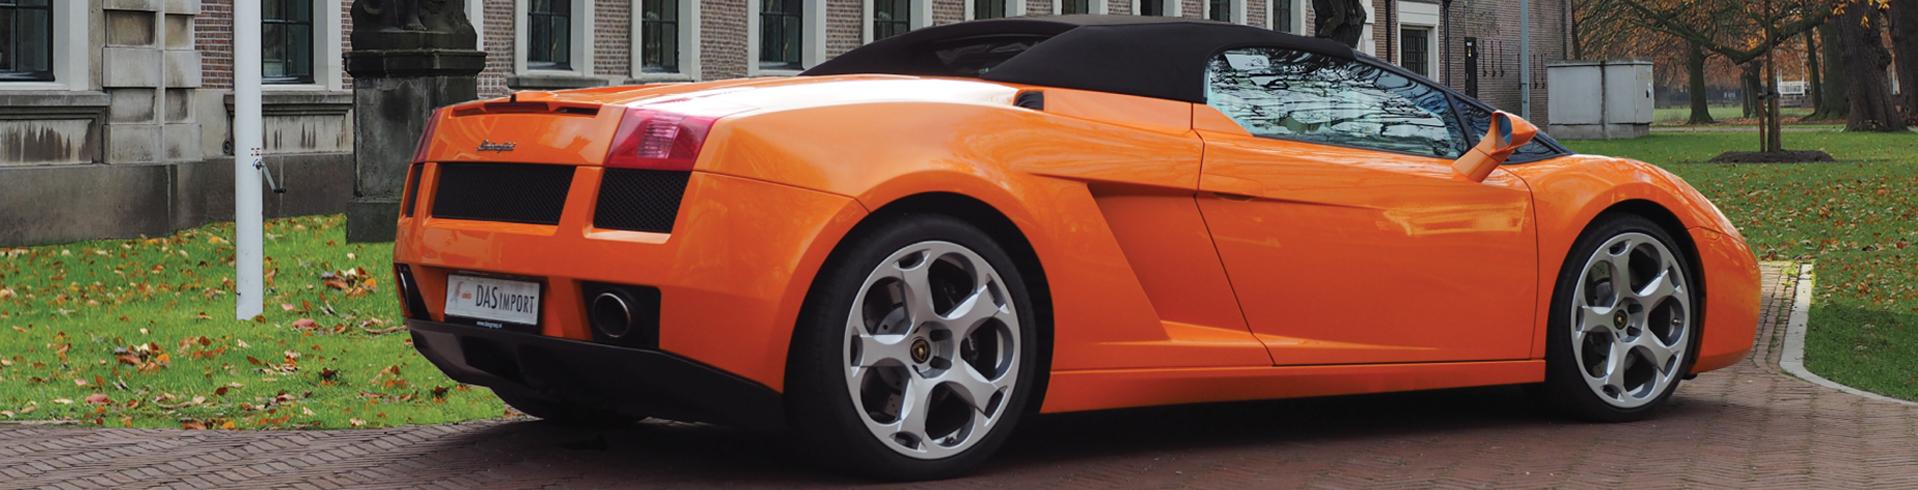 Lamborghini-Gallardo-Spyder-uit-Duitsland